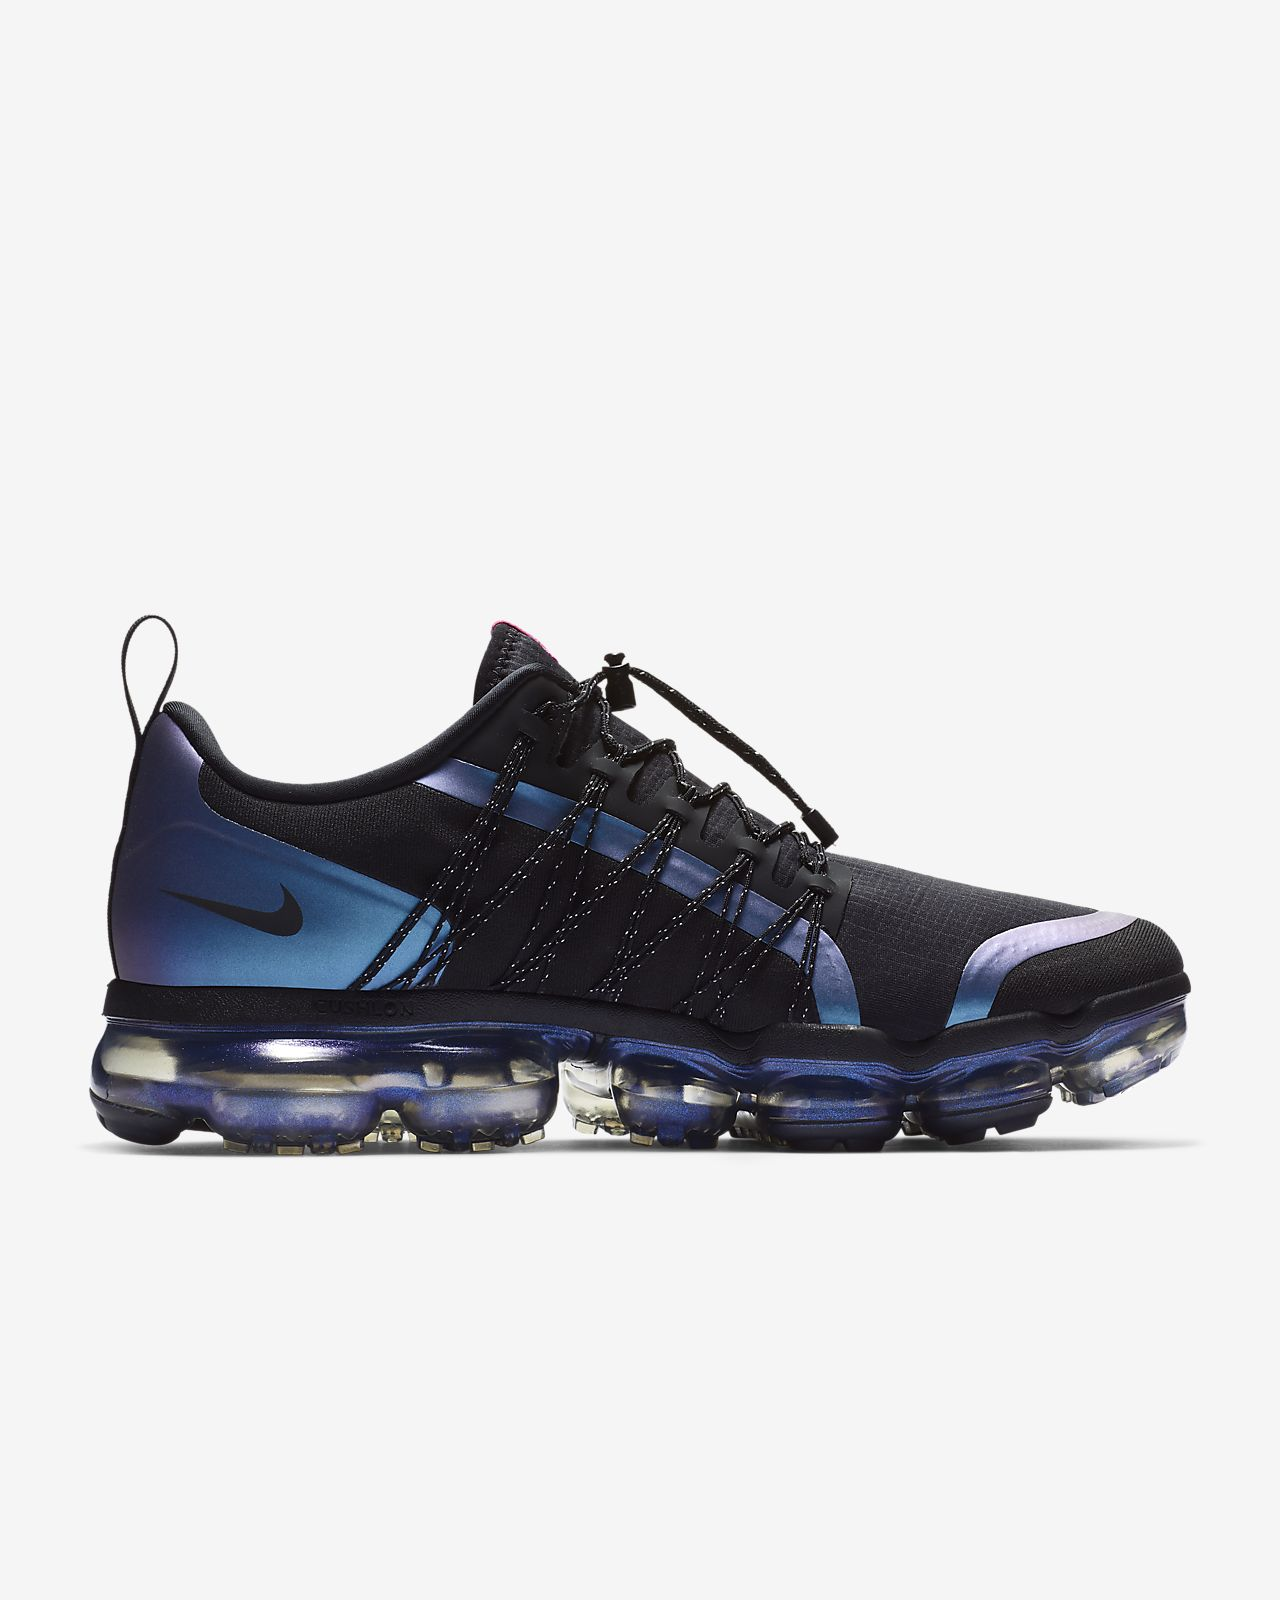 6b6692b92d8f9 Nike Air VaporMax Utility Men s Shoe. Nike.com CA